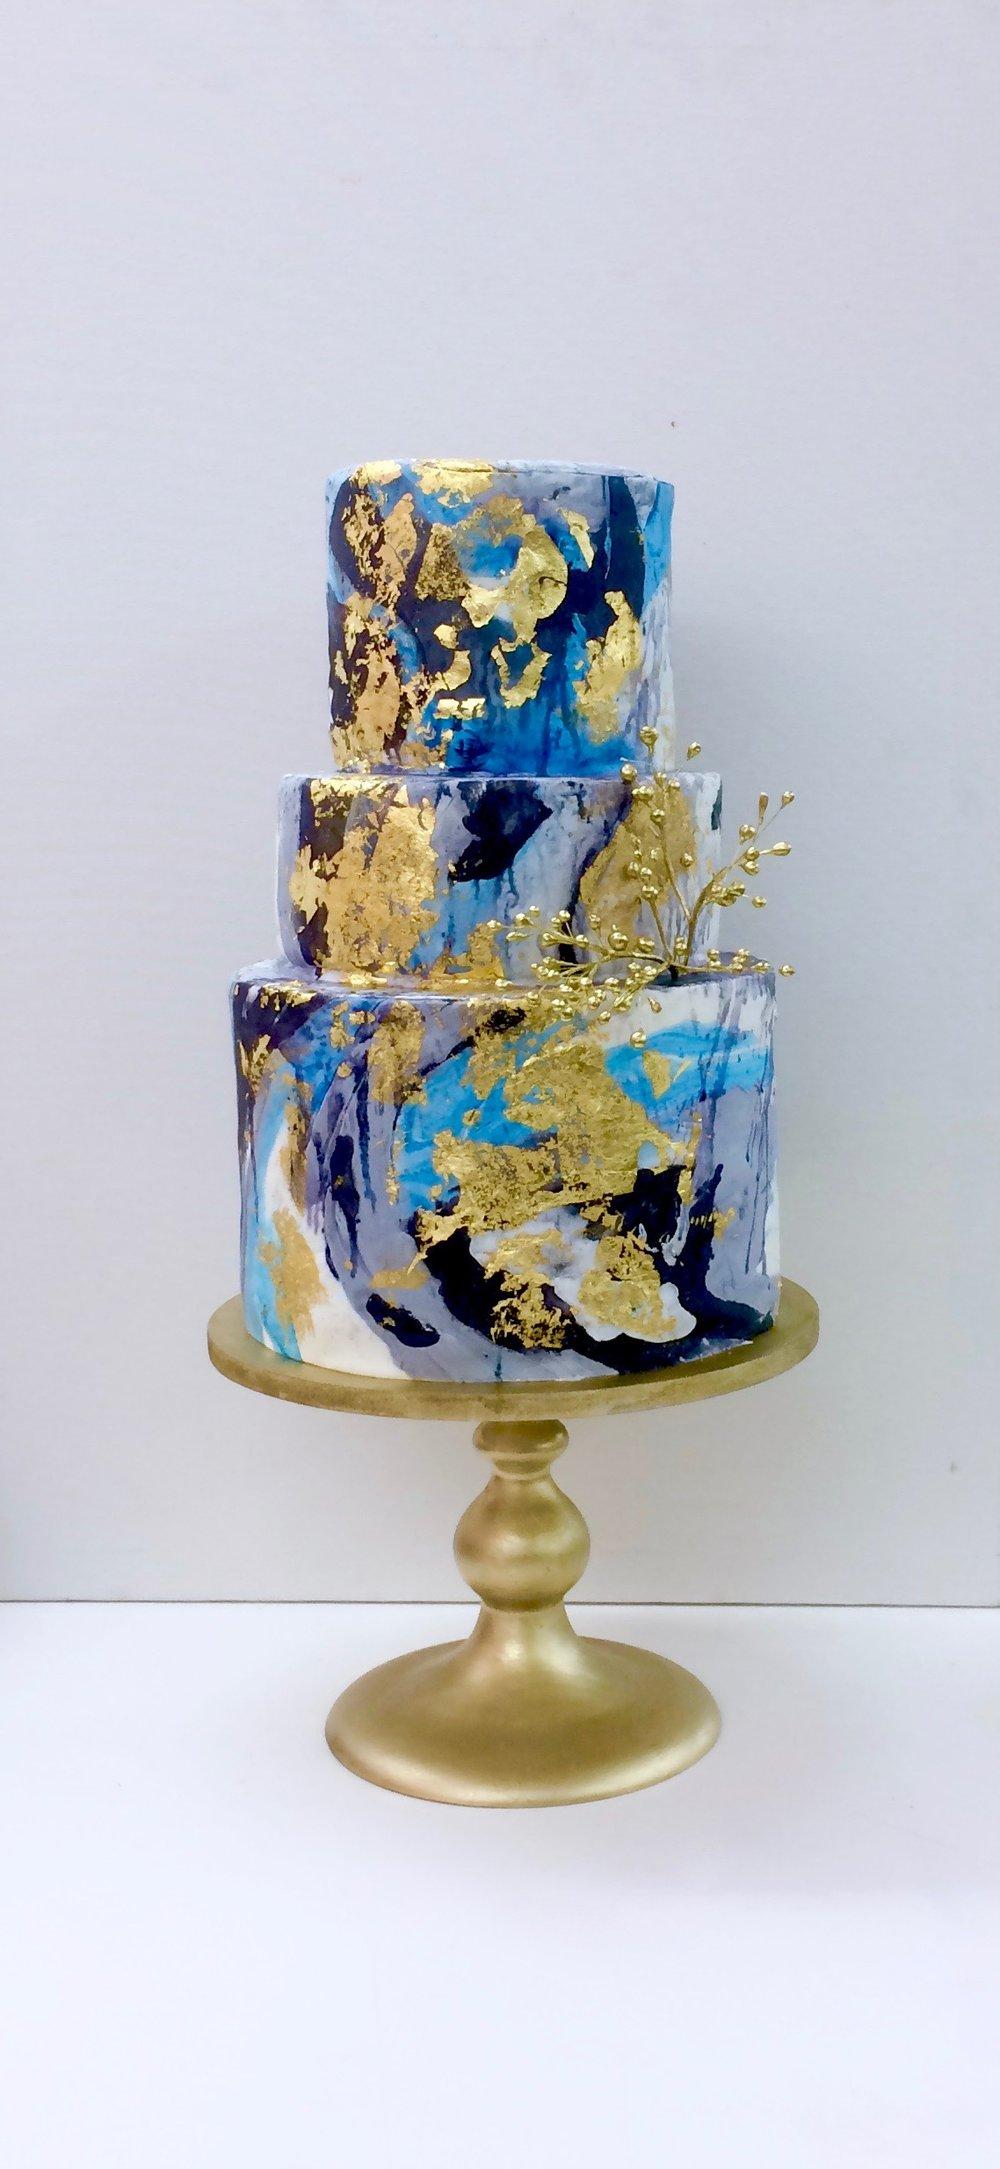 marble hand-painted cake by jaime gerard trinidad and tobago cake.jpg